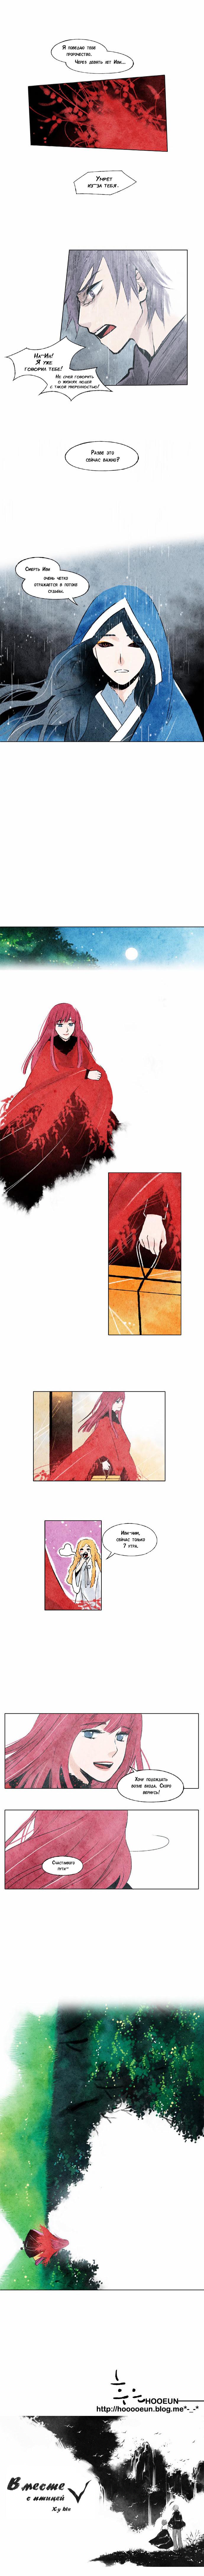 https://r1.ninemanga.com/comics/pic2/39/22503/1257044/1541334780262.jpg Page 4